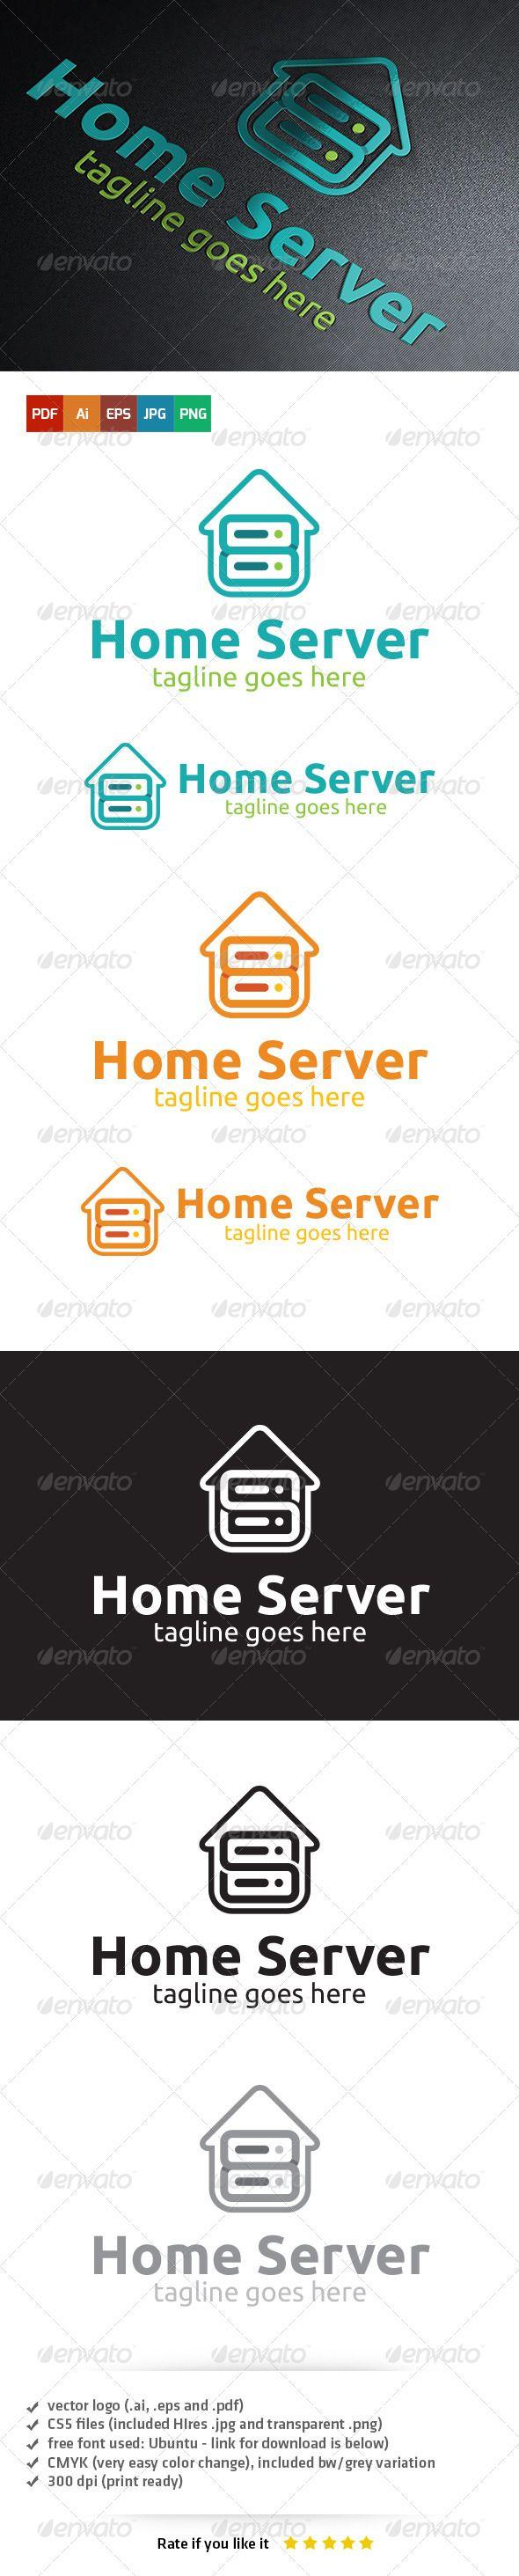 63 best logo templates images on pinterest logo templates font home server logo template